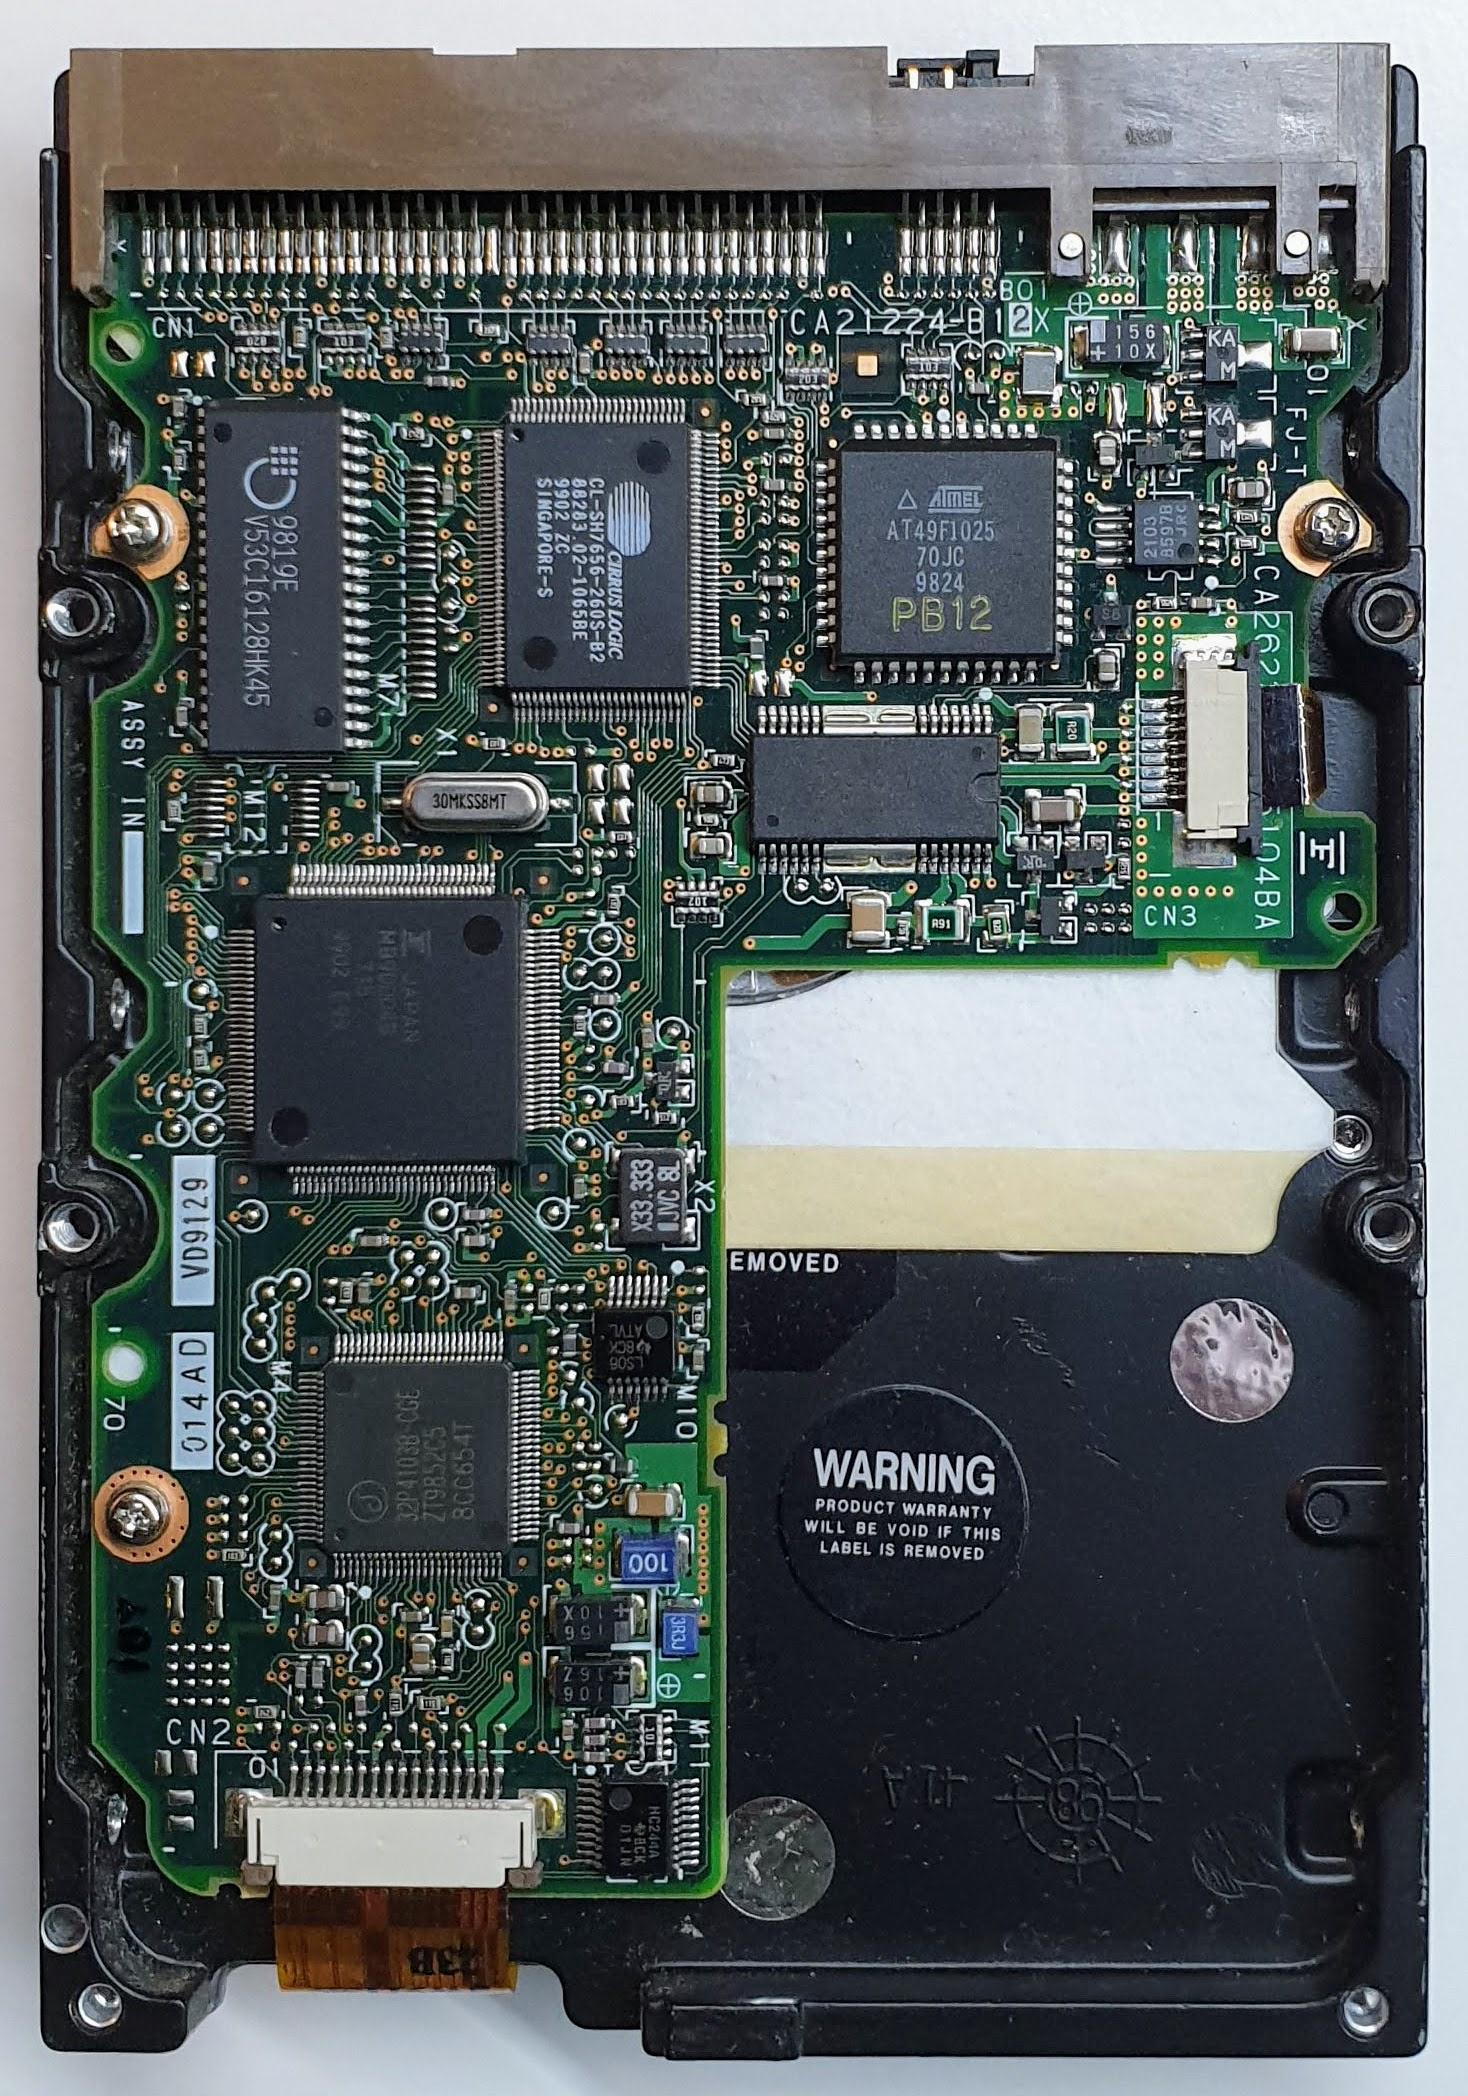 MPC3084AT Fujitsu MPC3084AT FUJITSU MPC3084AT